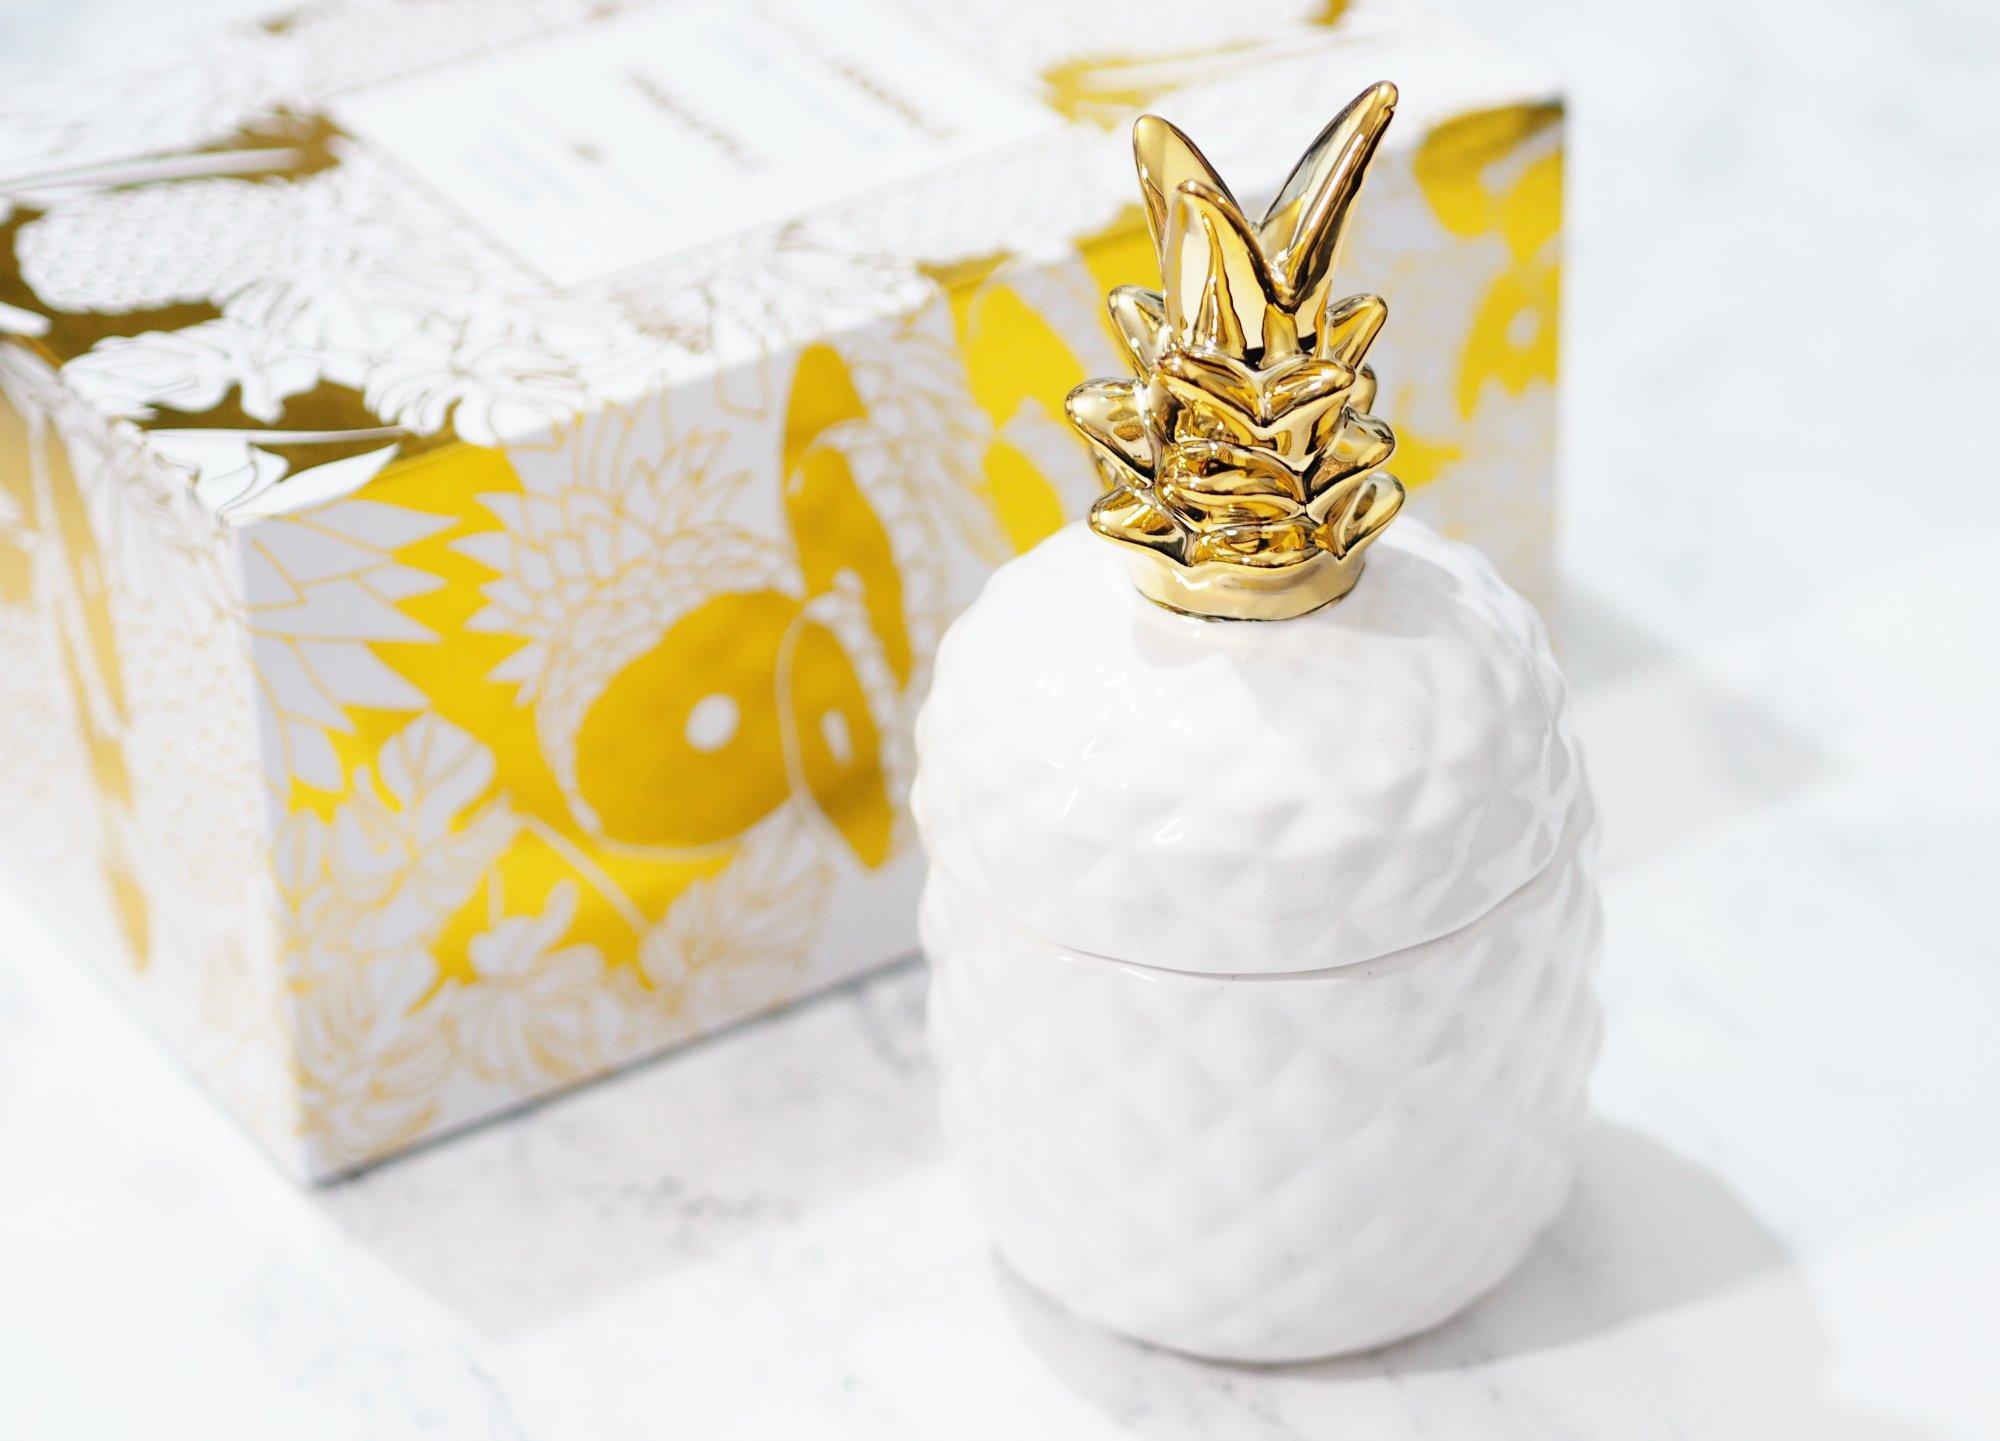 Royal Essence Pineapple Jewellery Candle